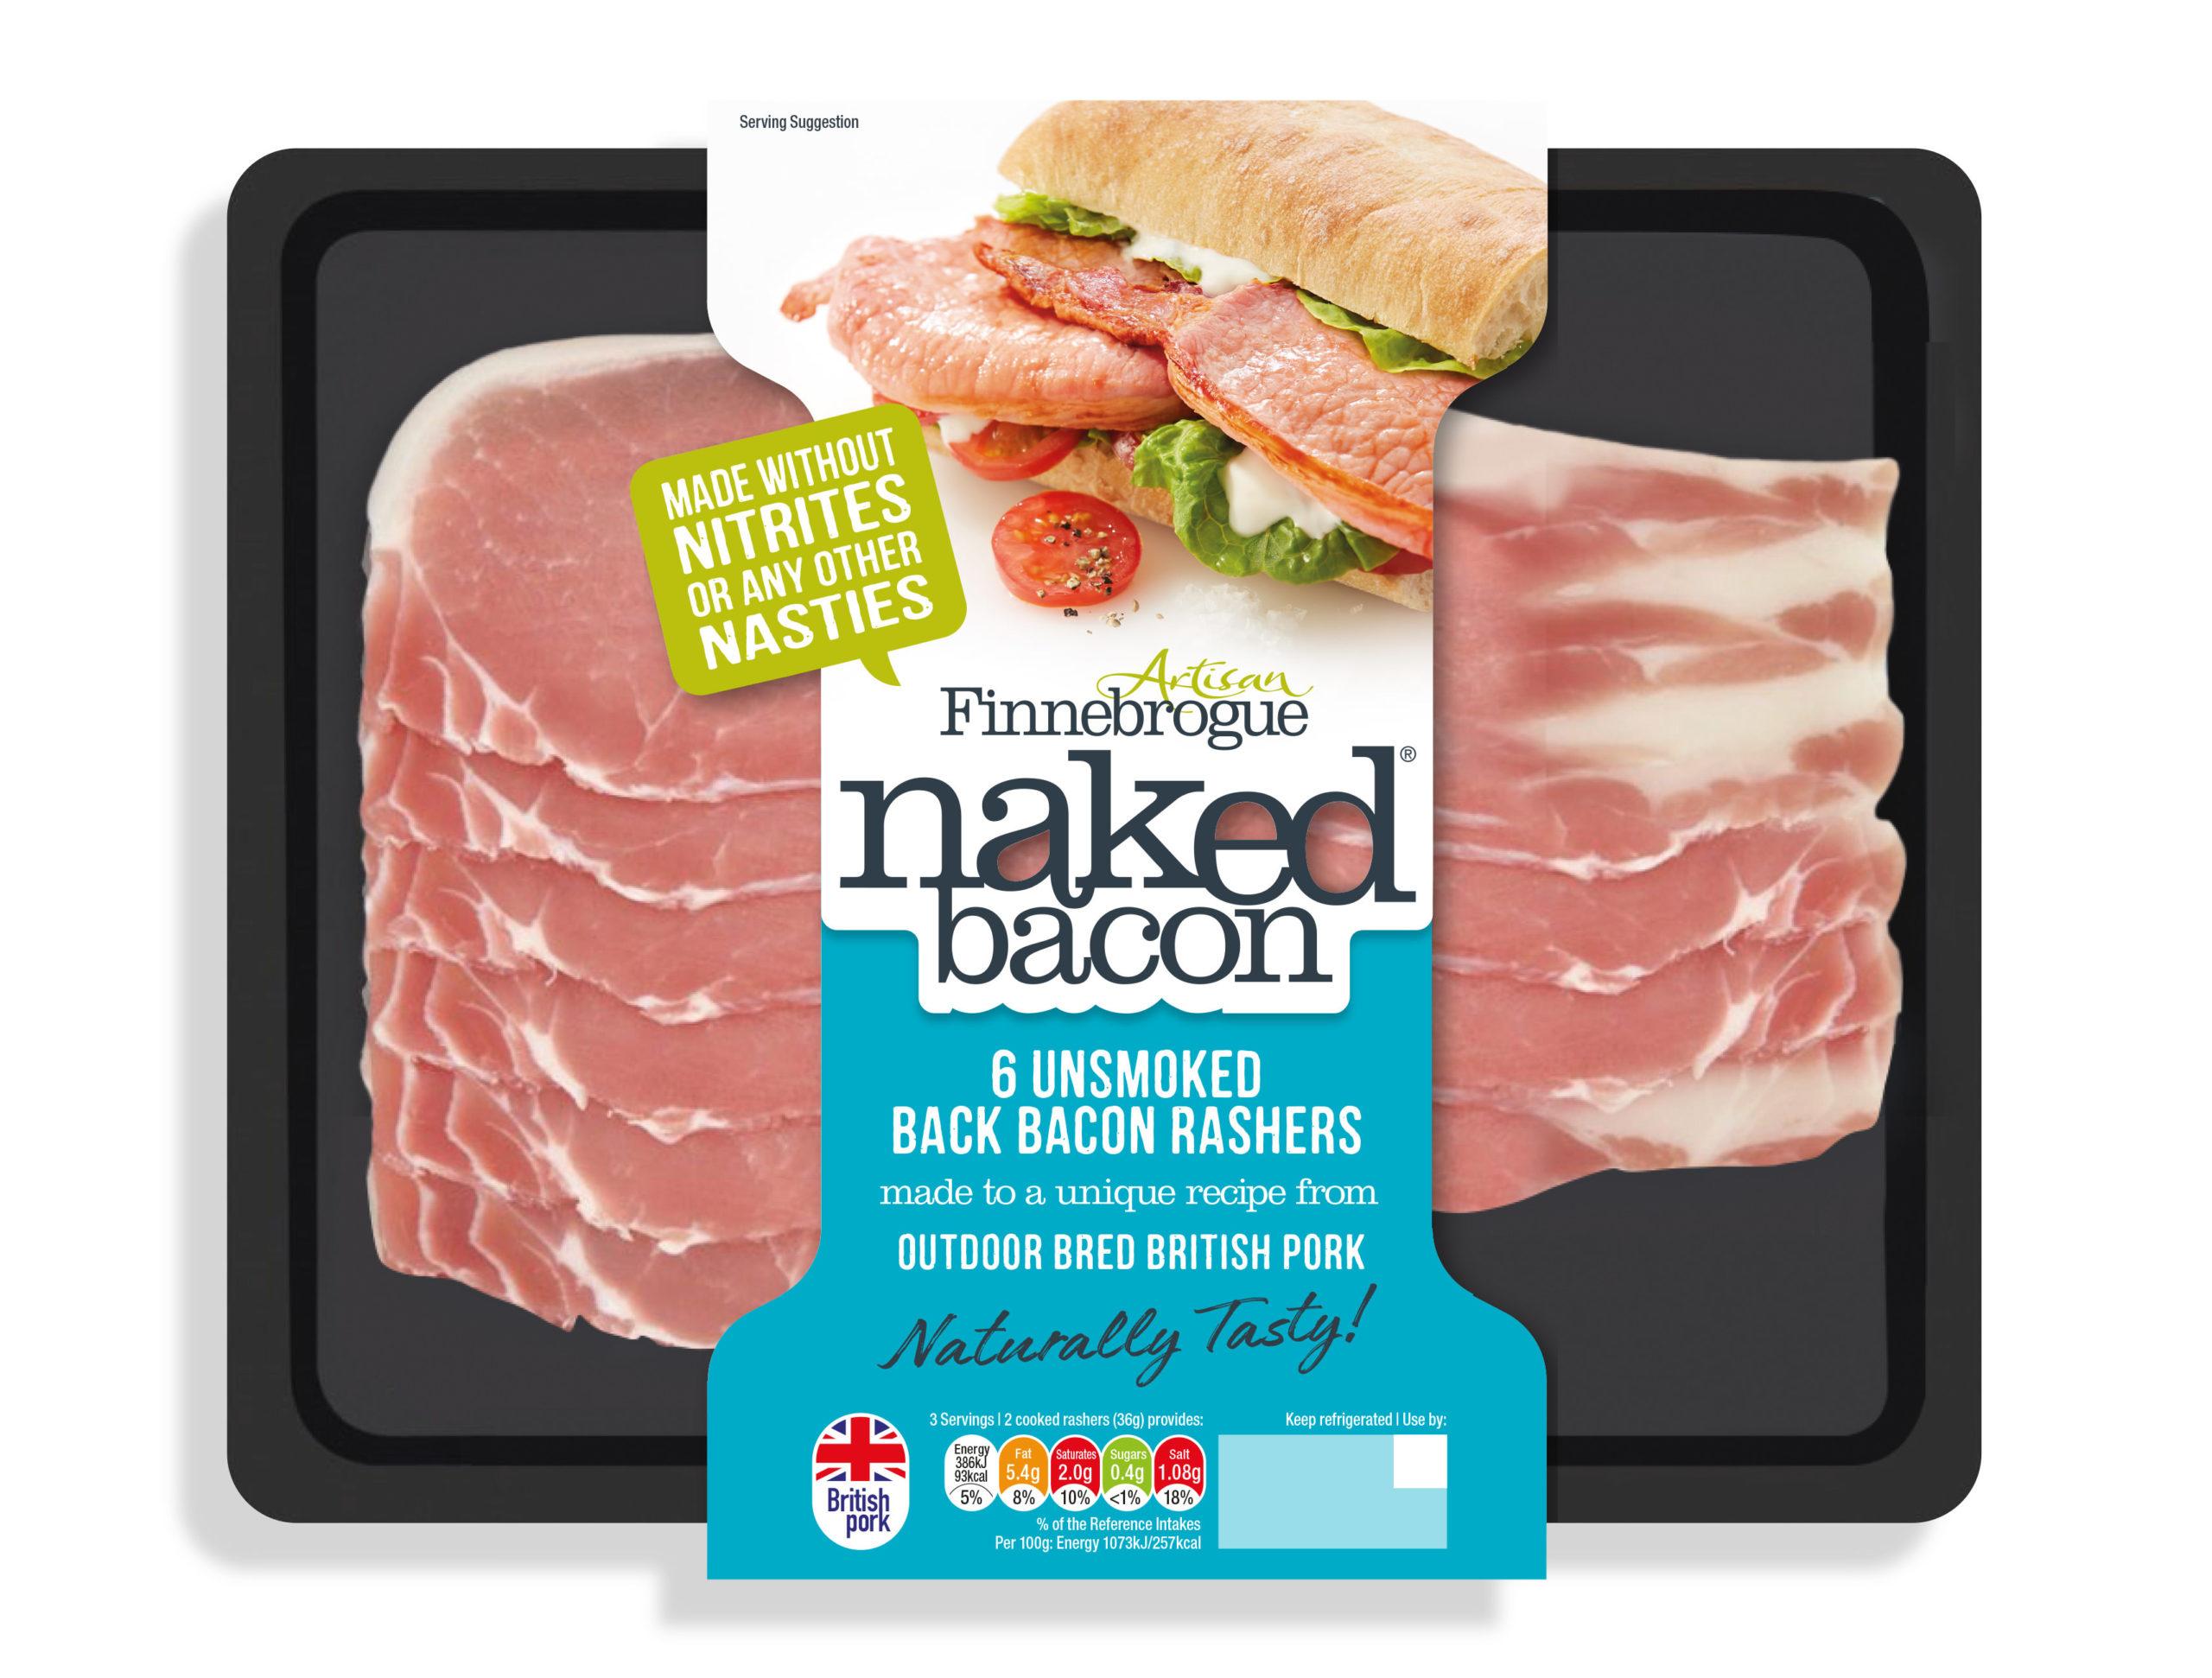 Finnebrogue Naked Unsmoked Back Bacon Rashers